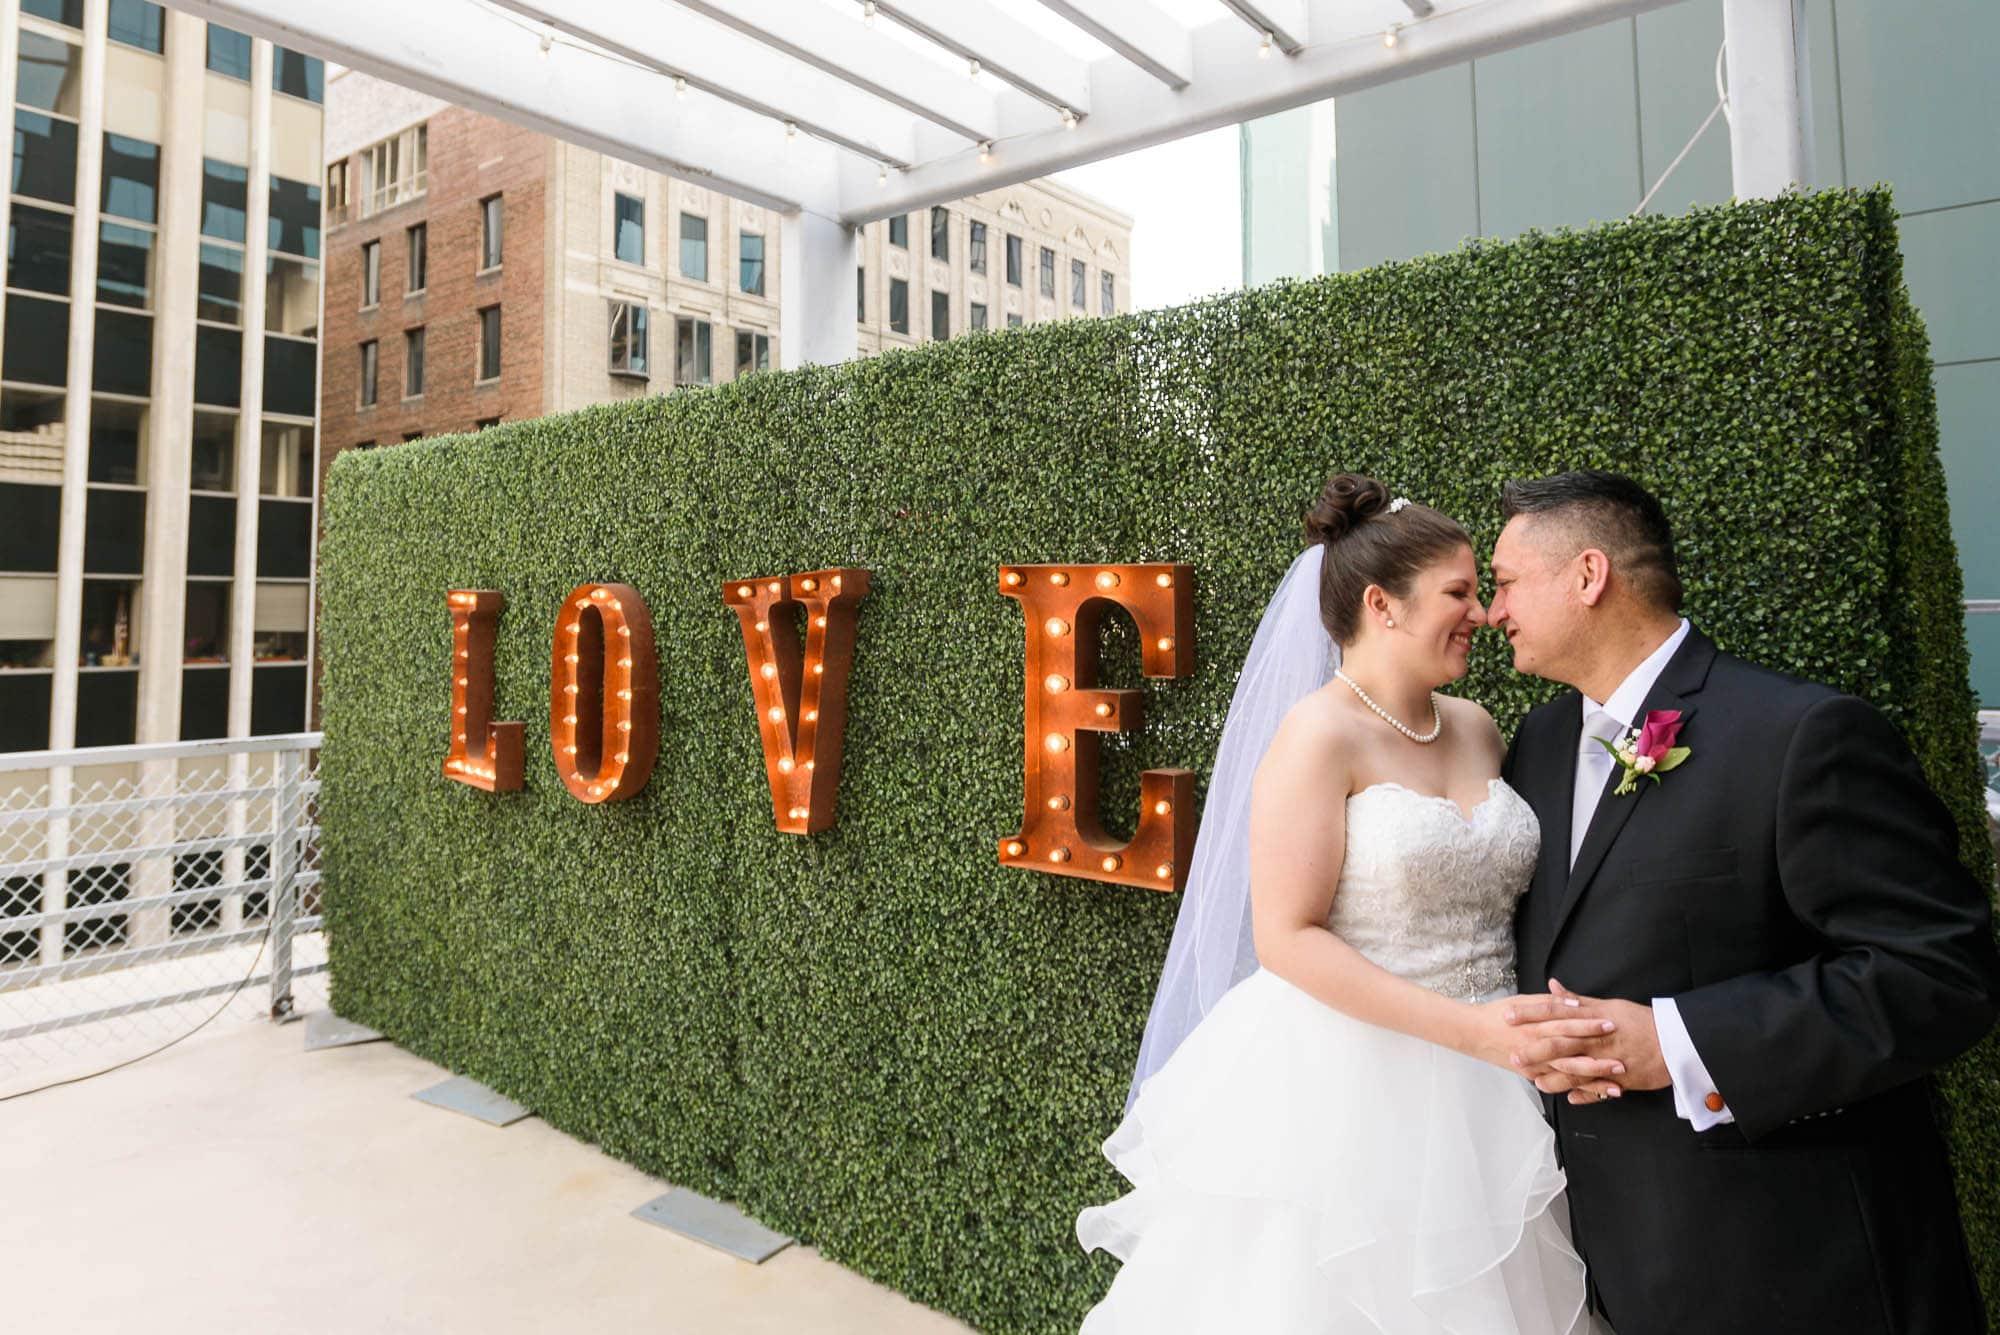 011_Alan_and_Heidi_Wedding_Nicole_Roman